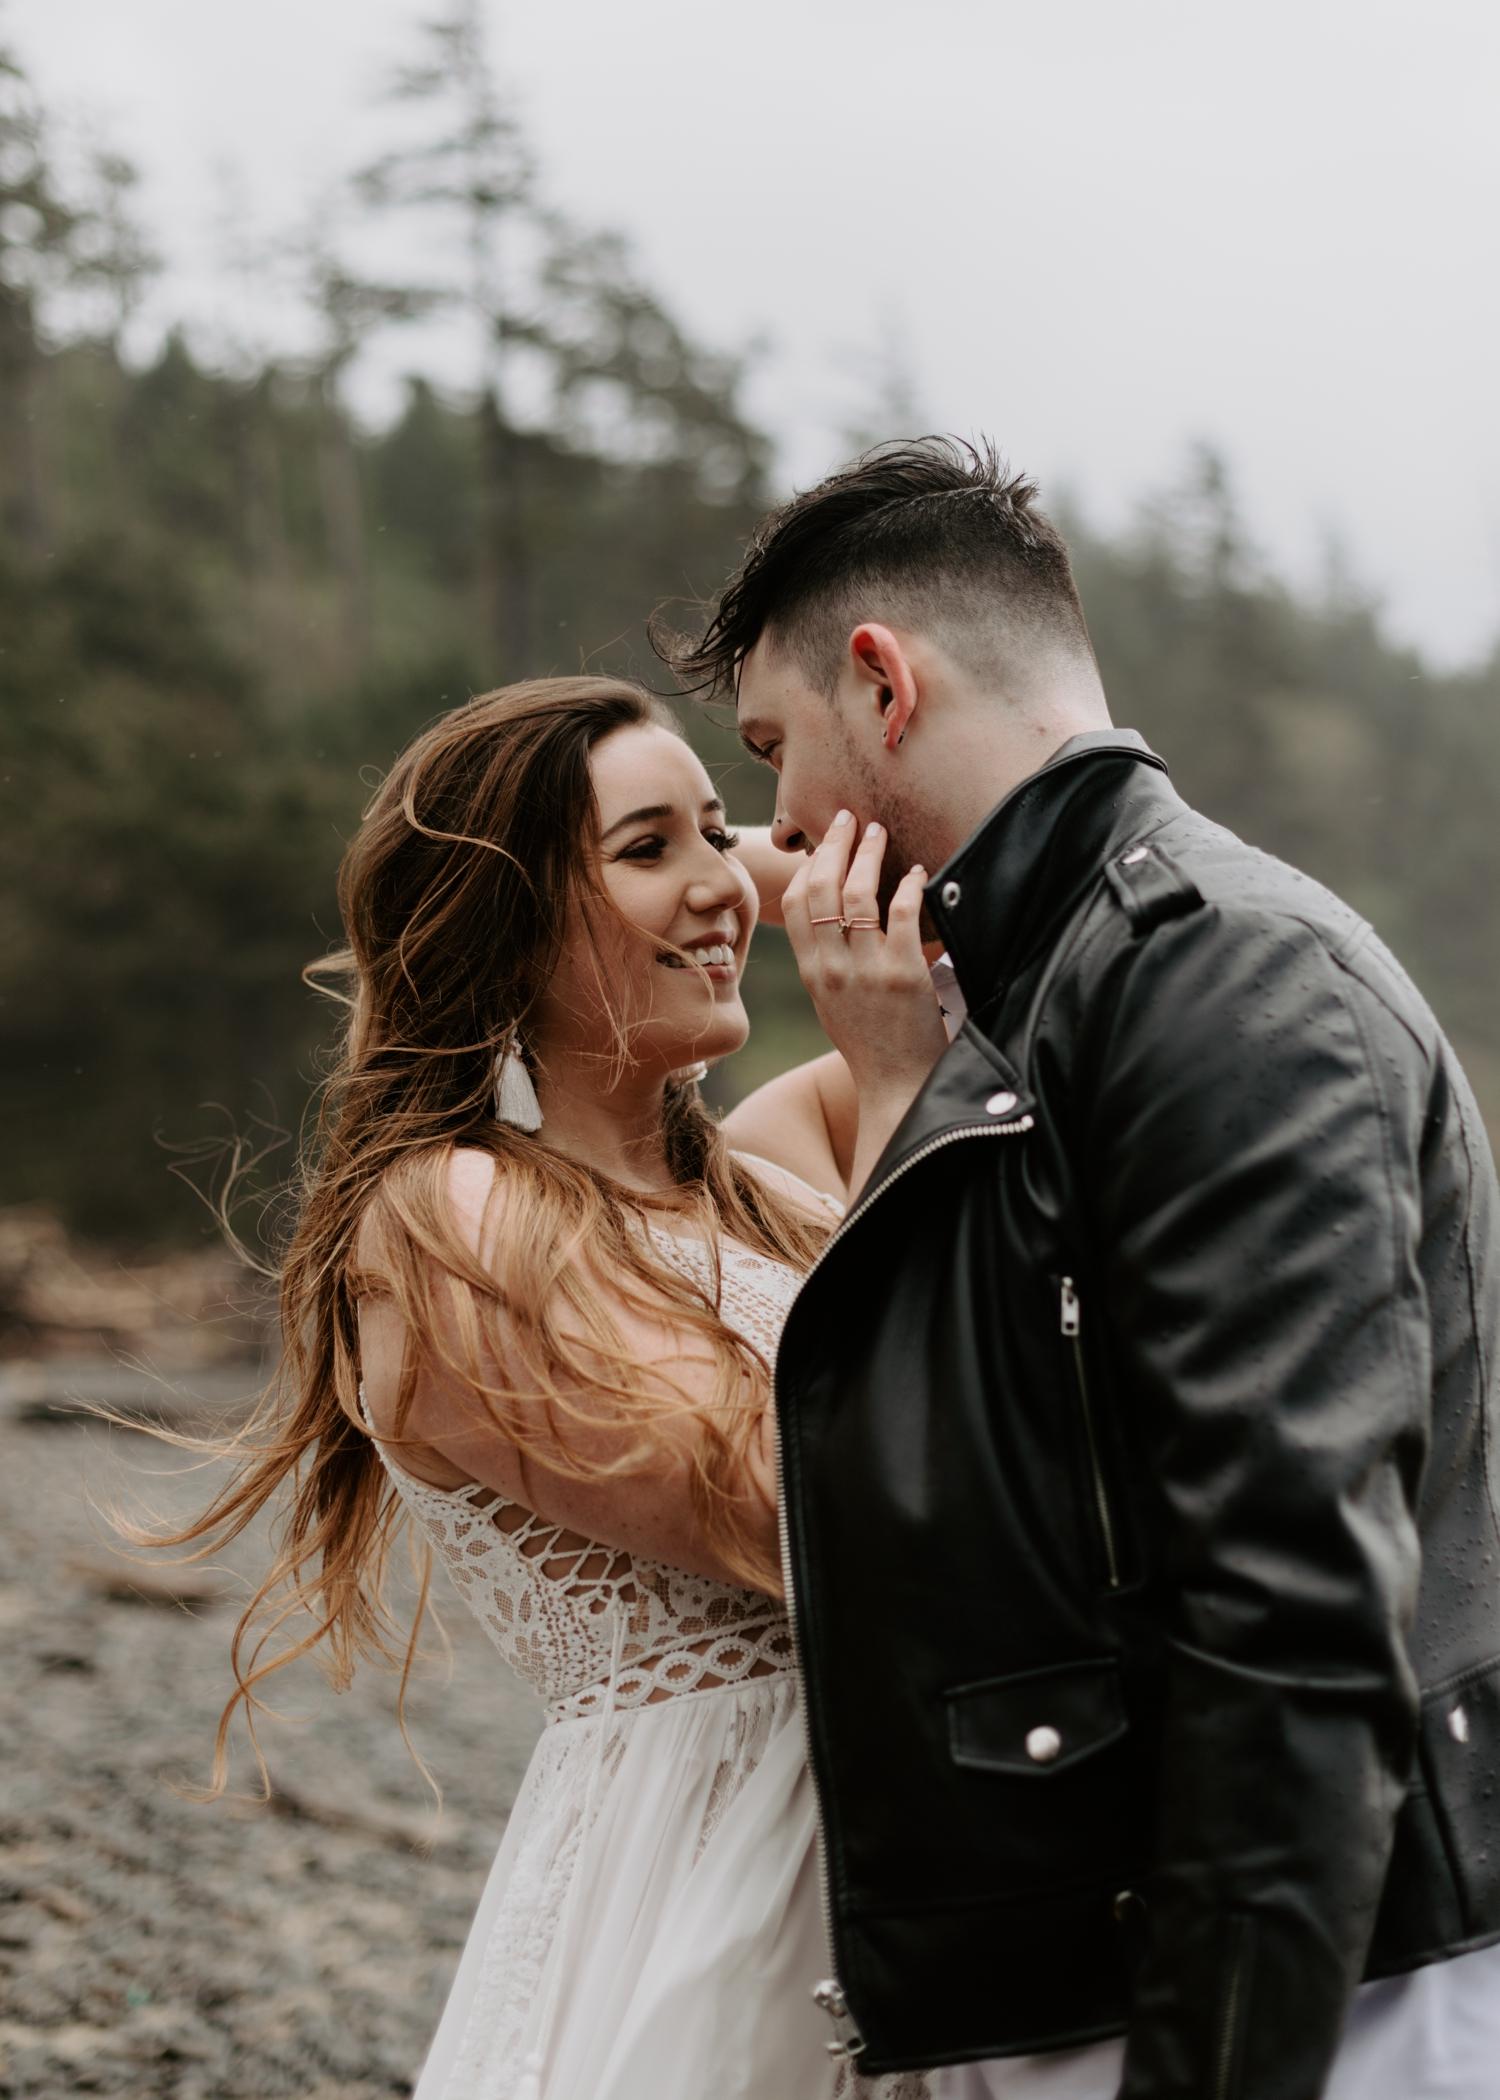 intimate-oregon-coast-elopement-2018-04-26_0014.jpg